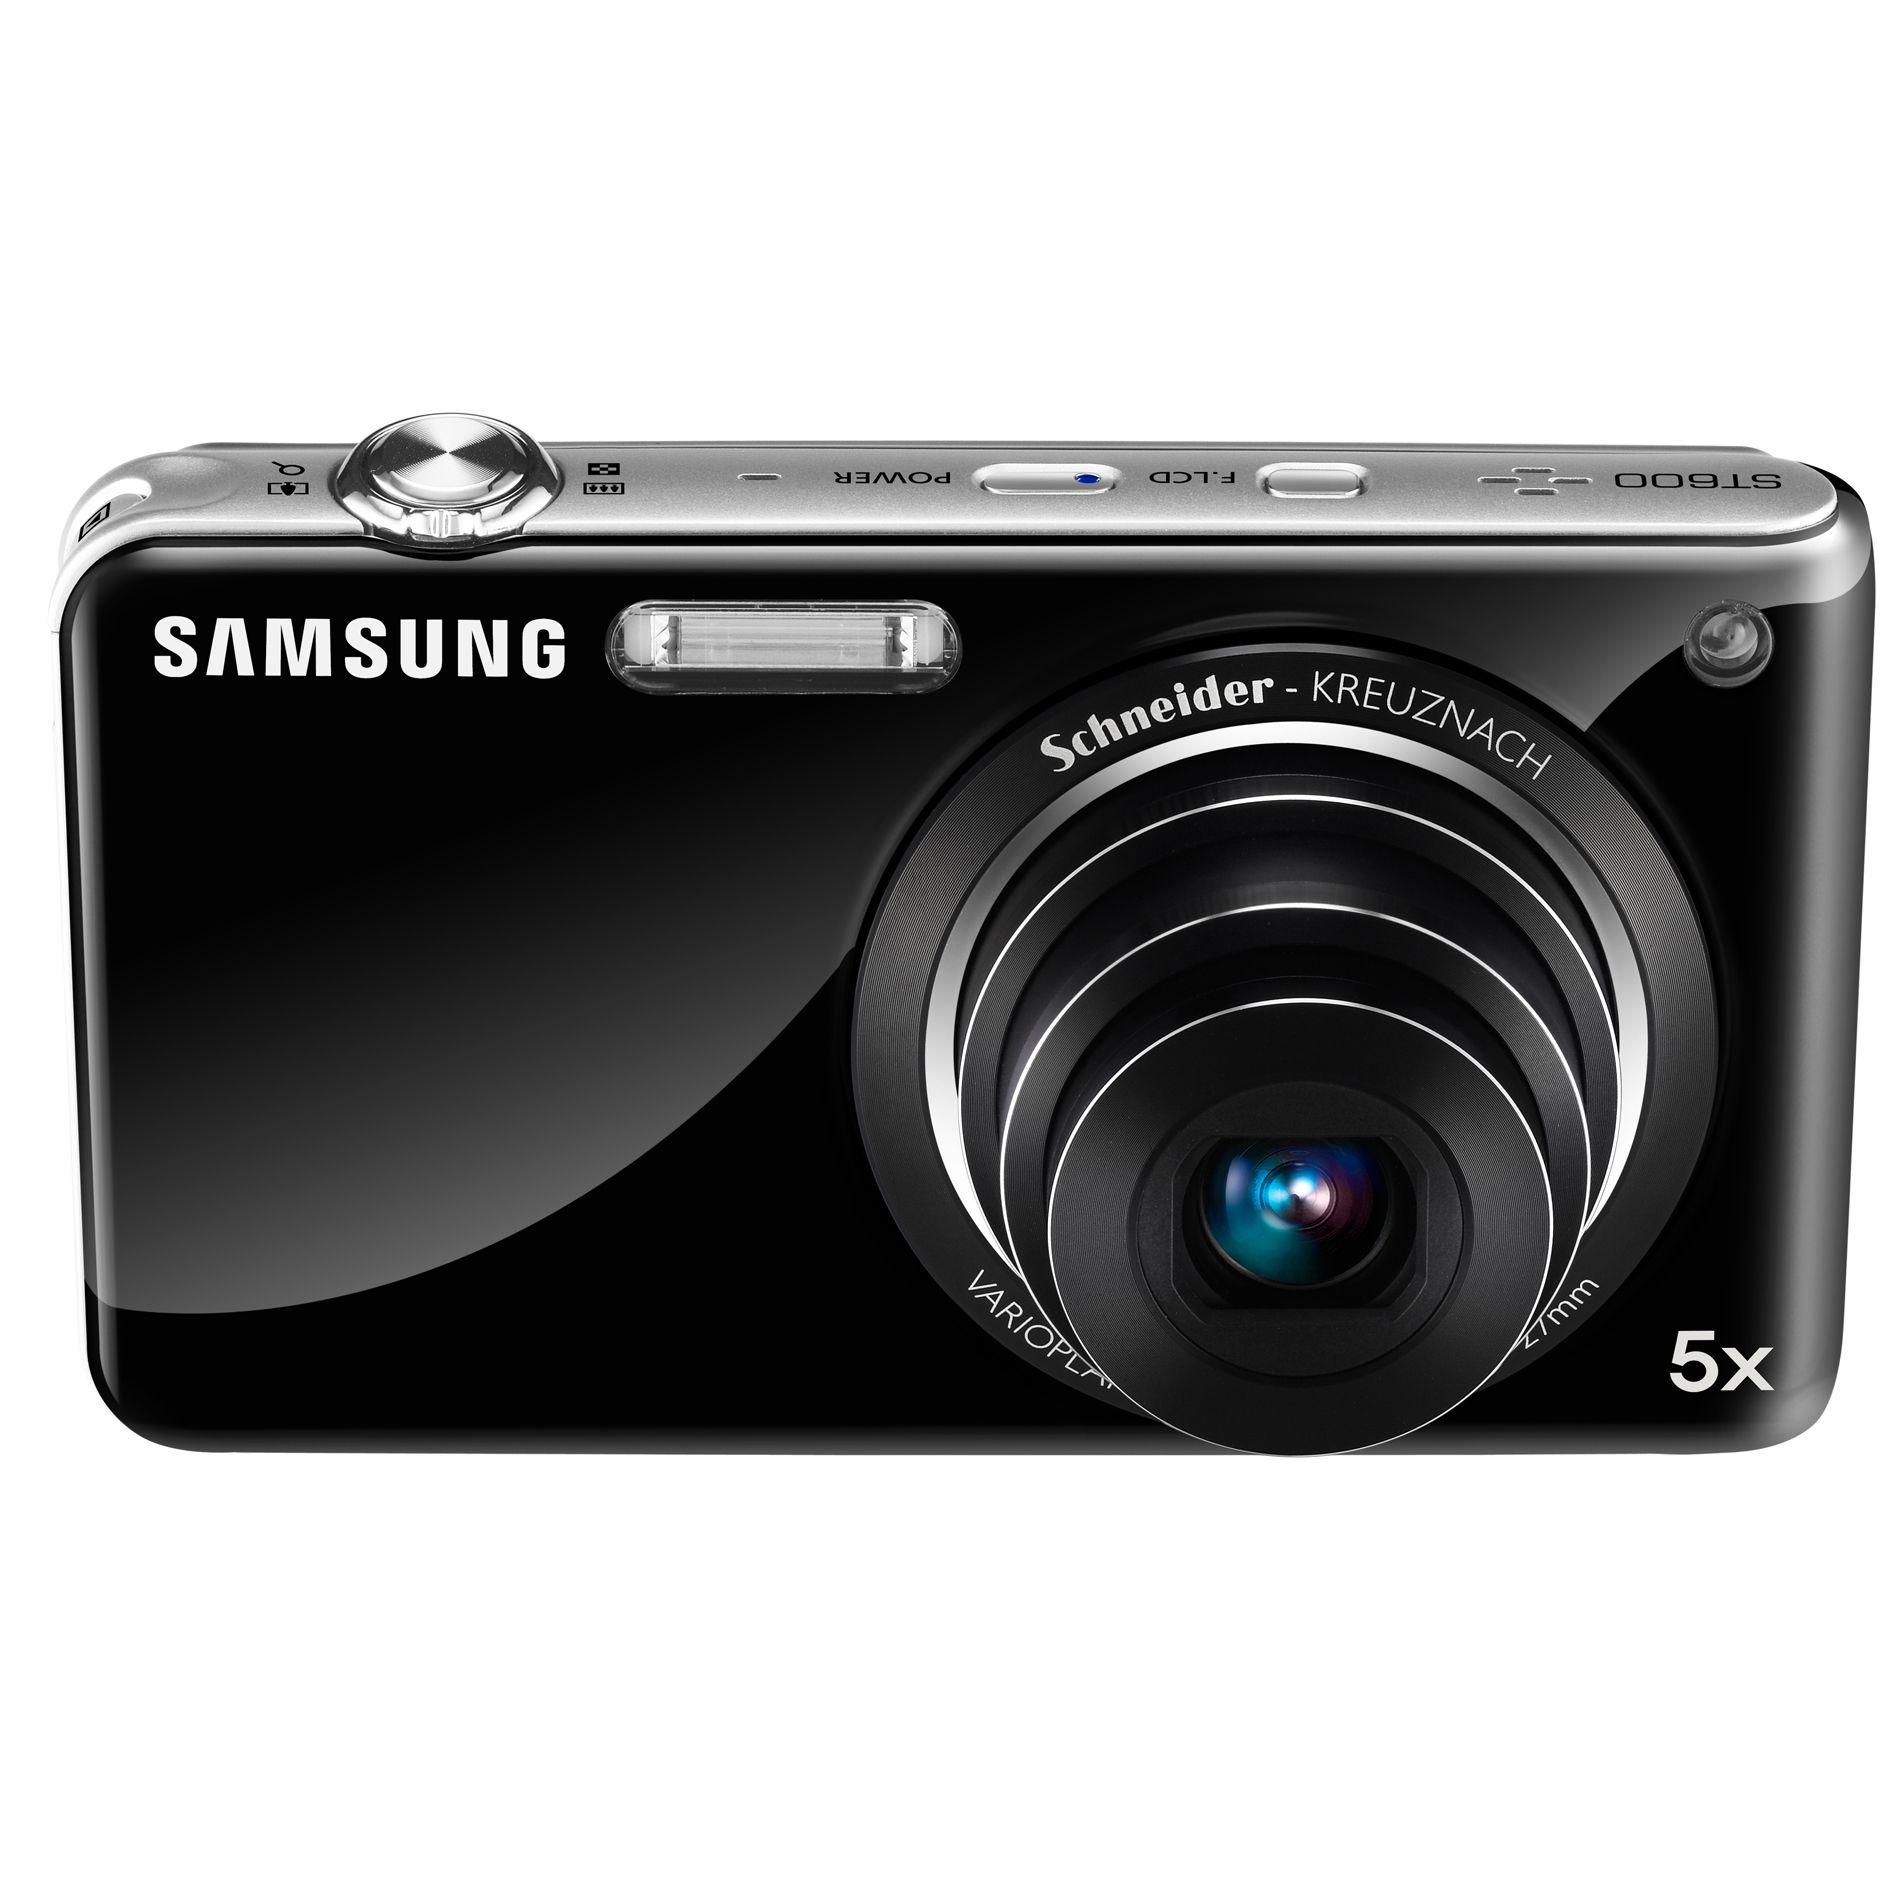 Samsung ST600 Digital Camera - Black